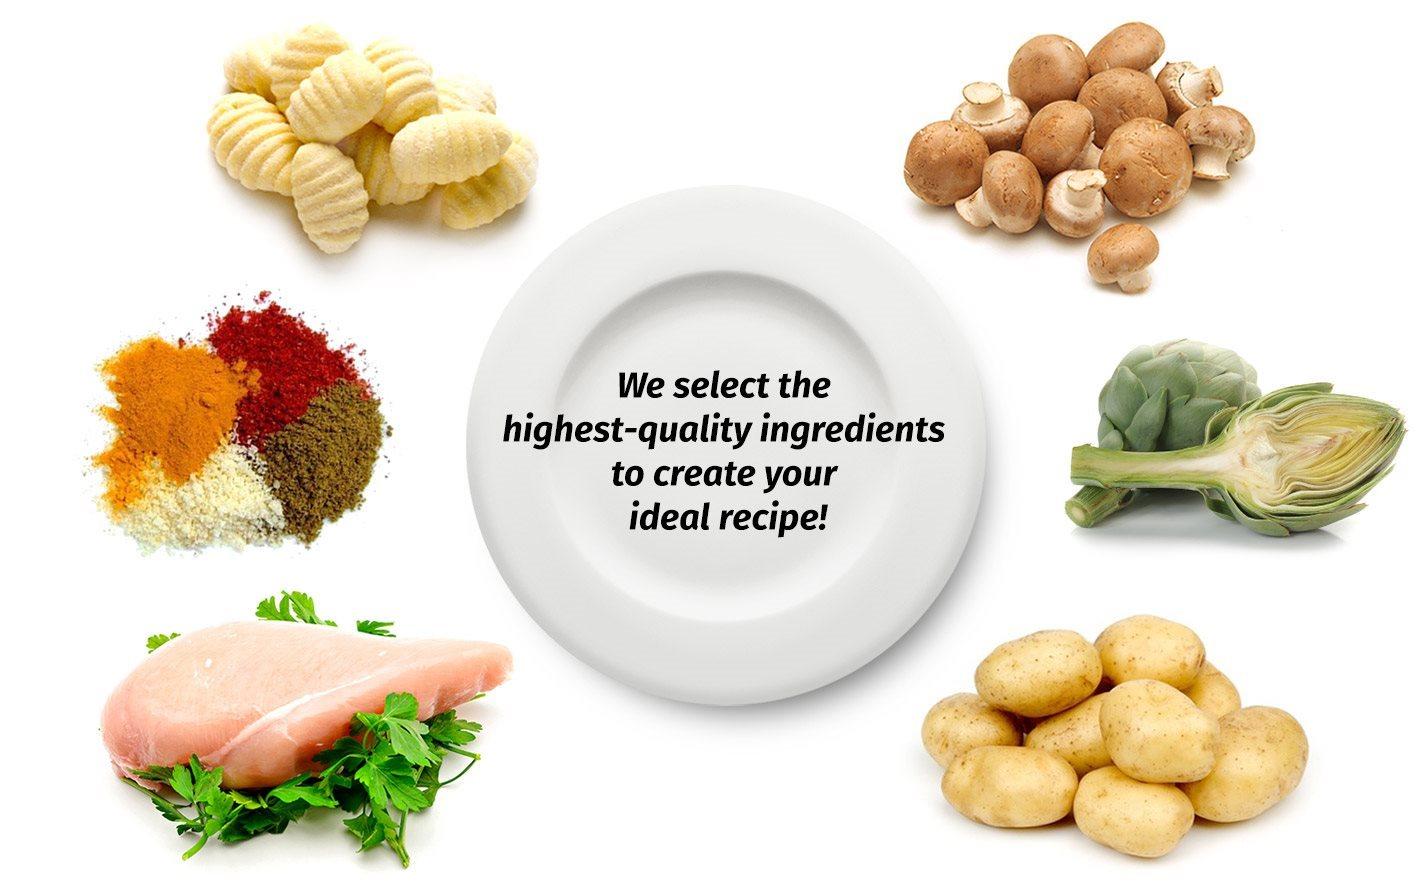 surmont_mix-ingredienti-ricetta-personalizzata_eng(0)